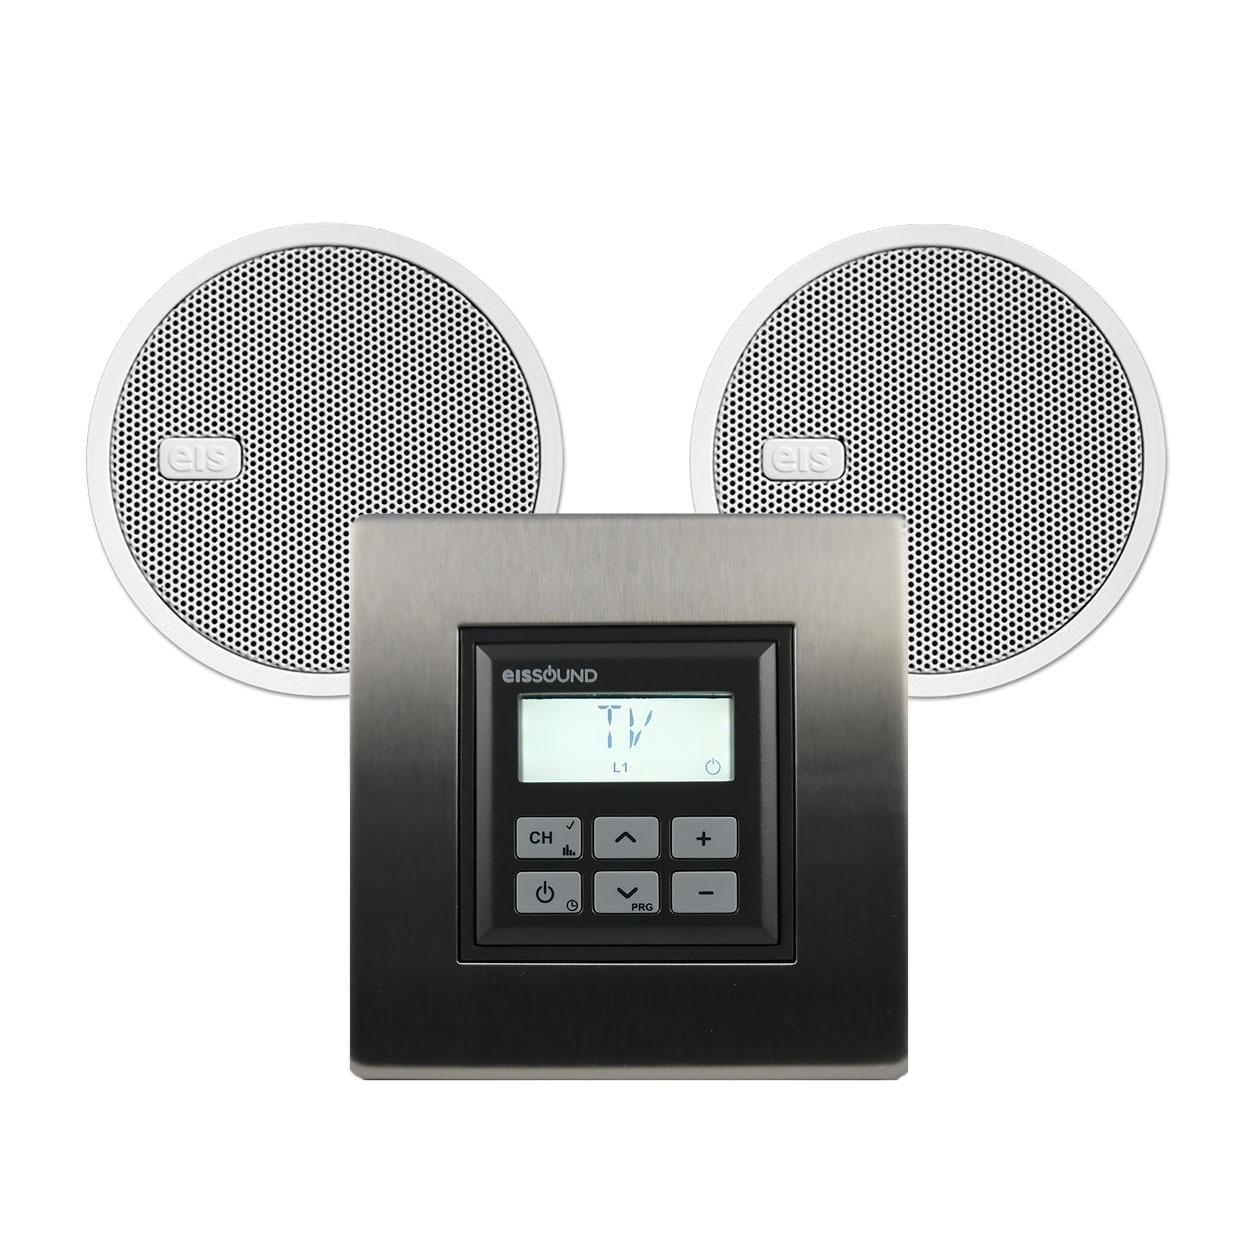 KB Sound Mando Integrated home radio system